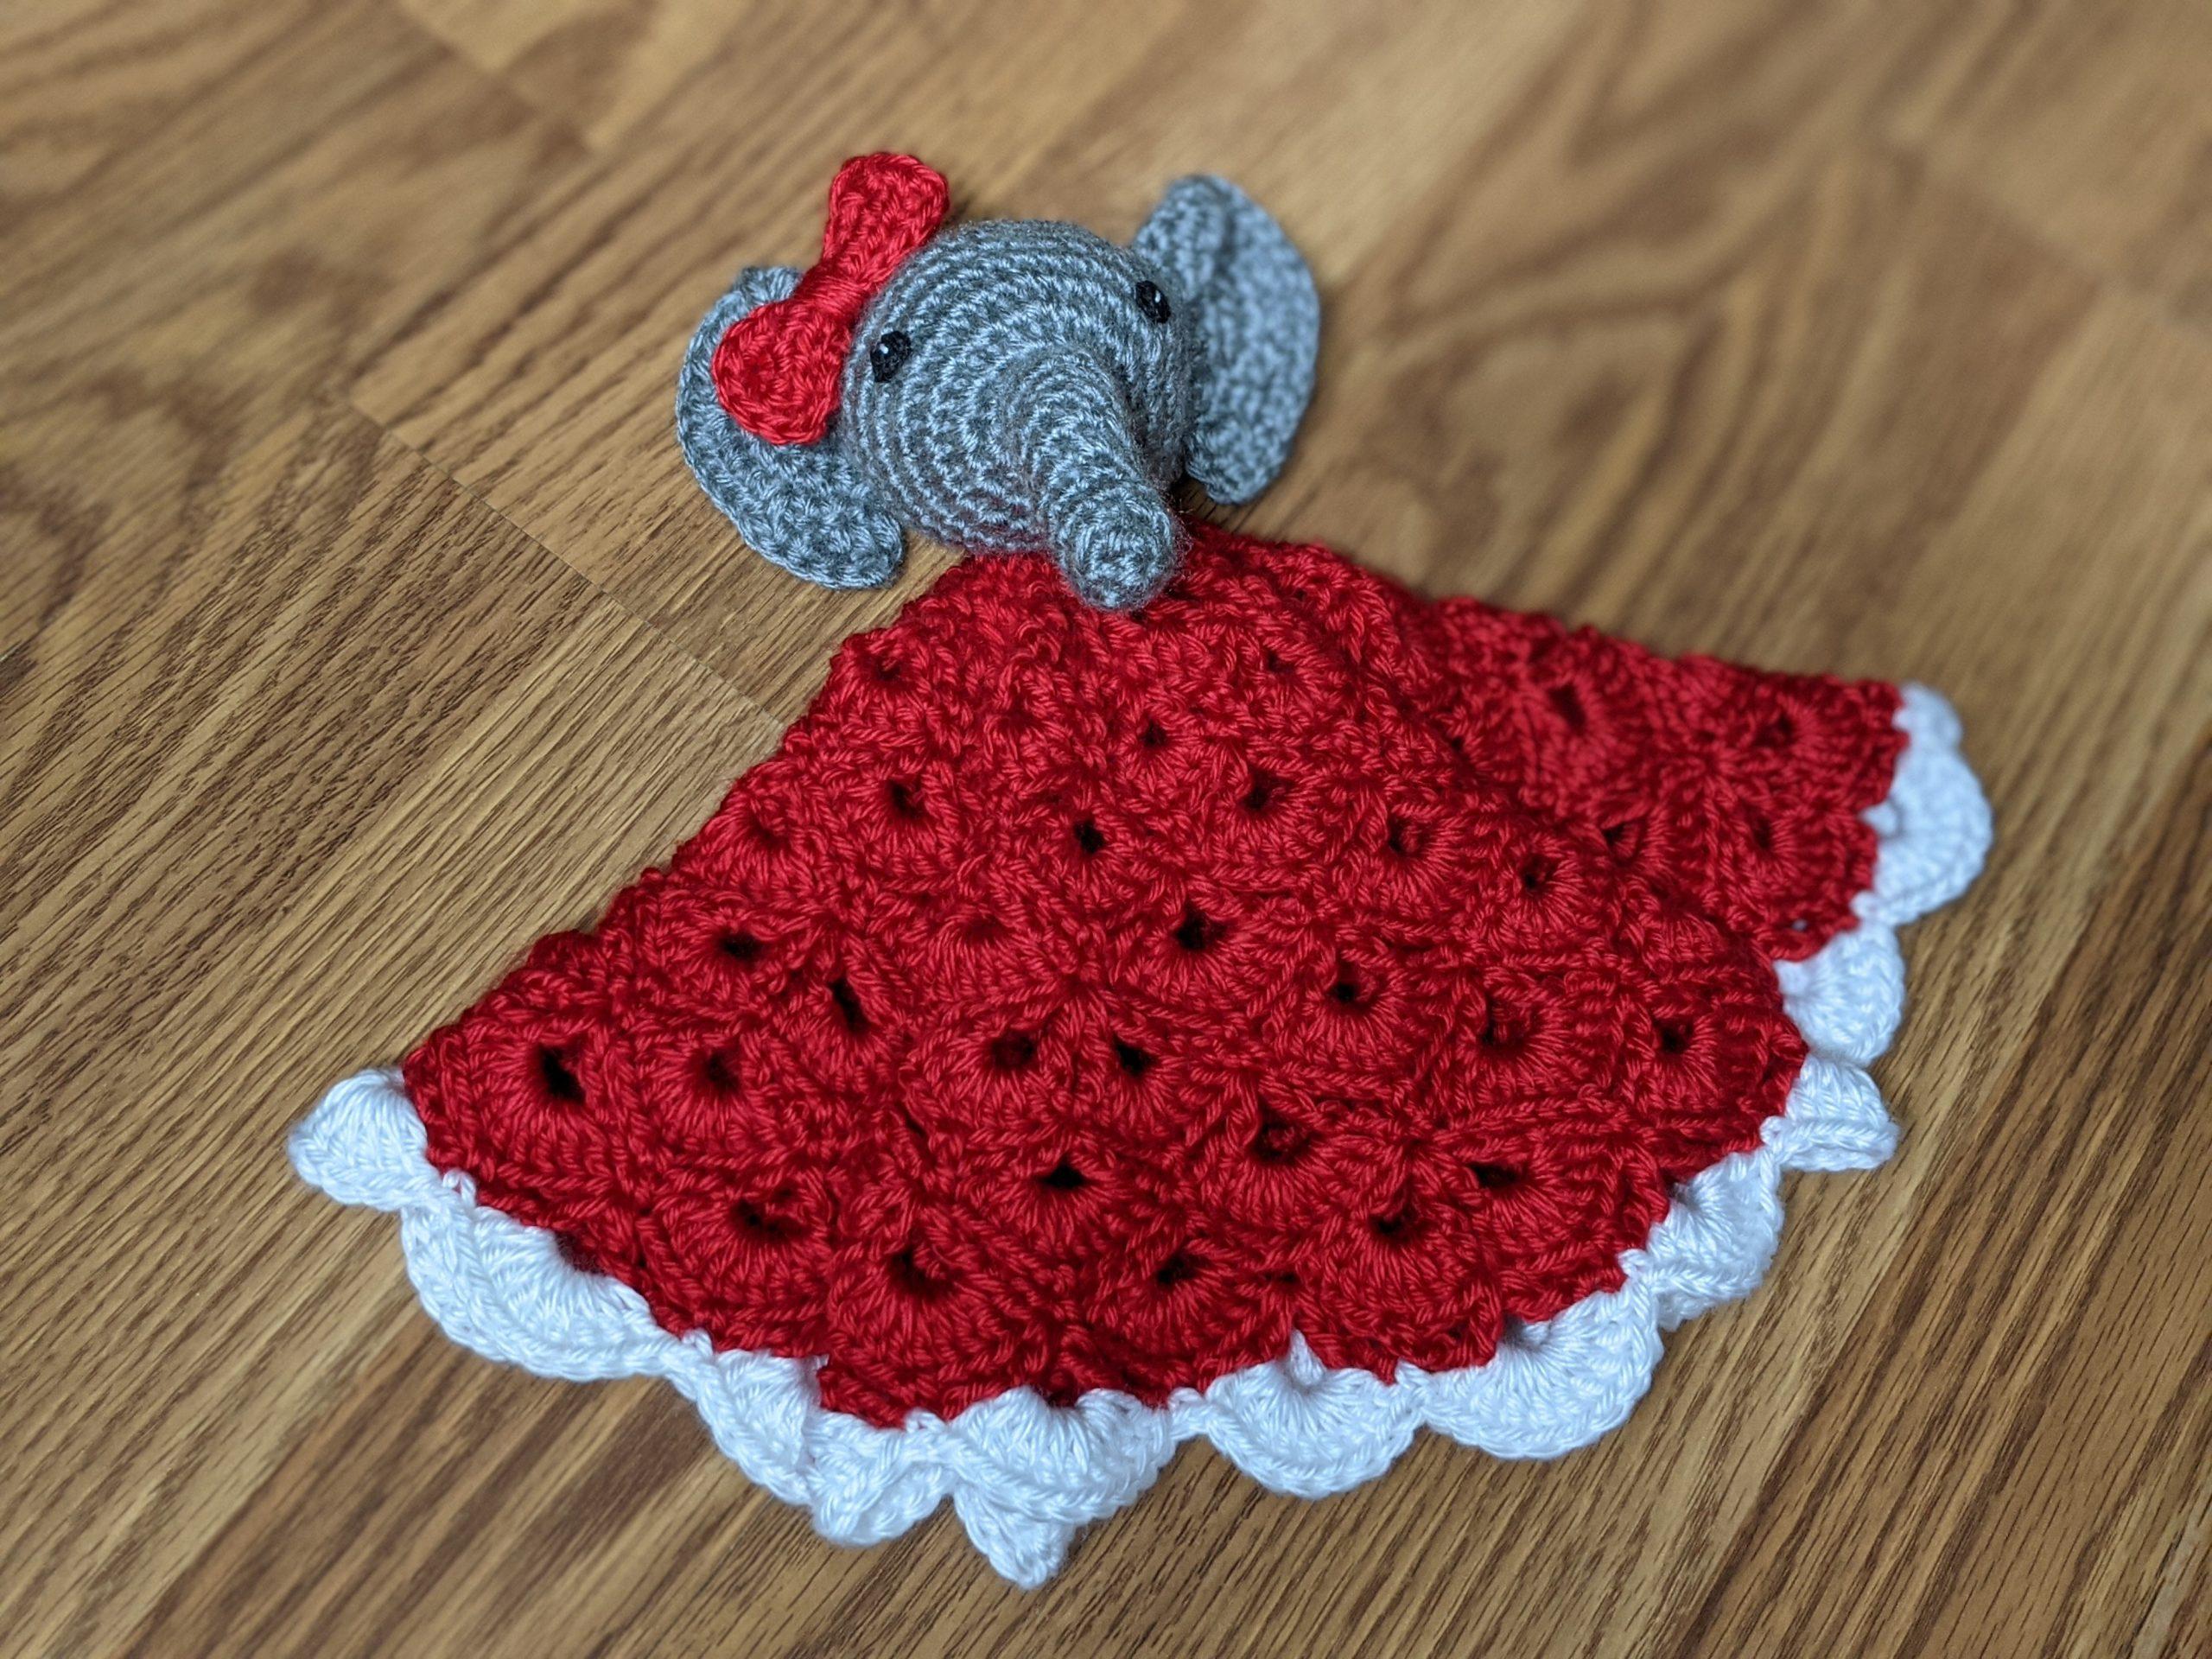 Claire Messy Bun Hat